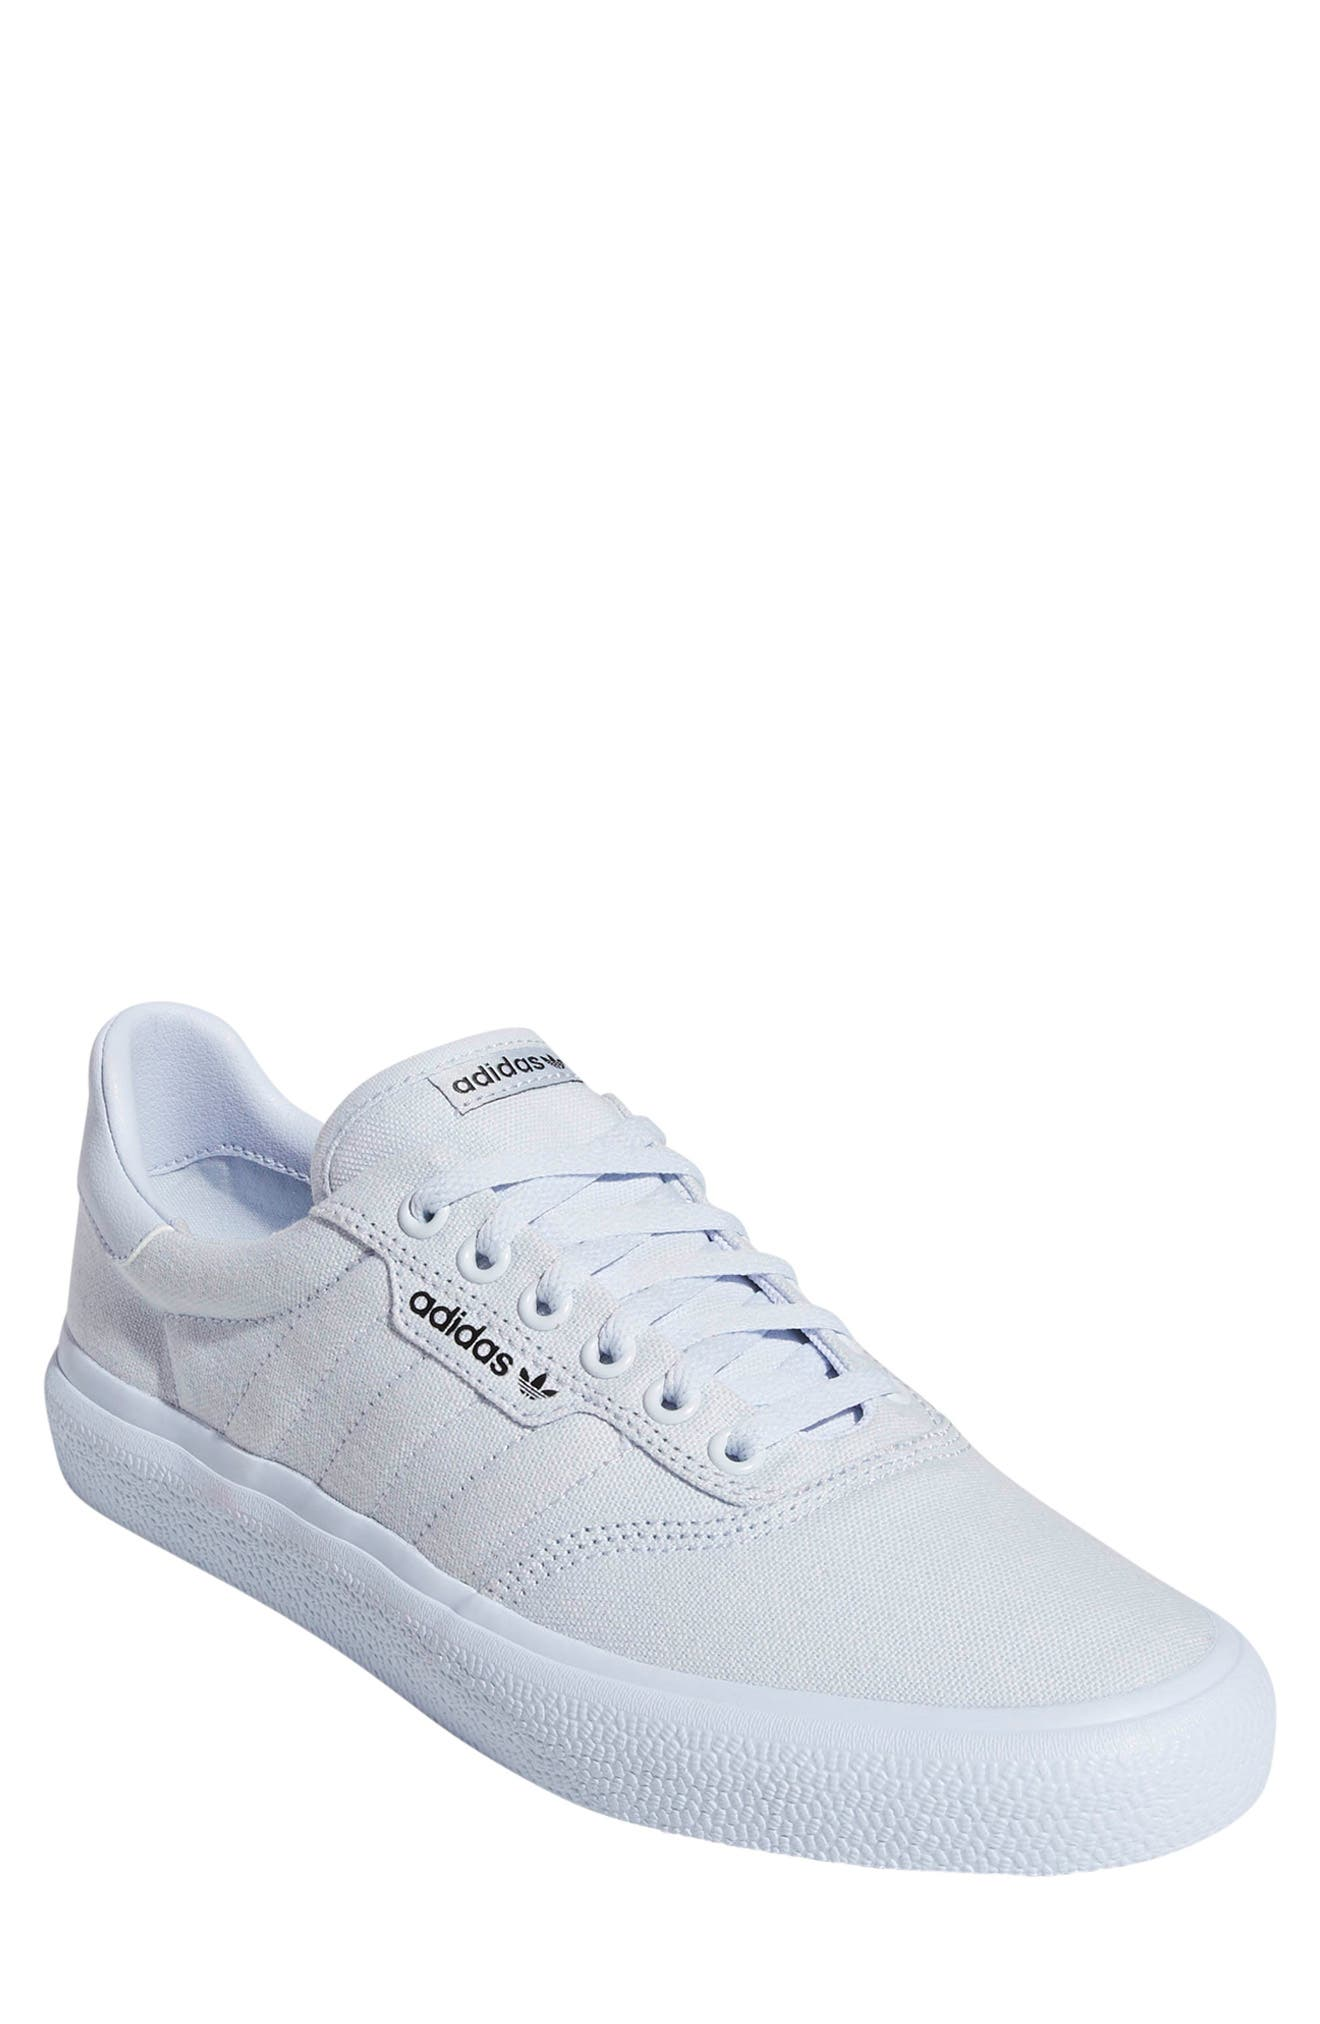 adidas | 3MC Vulc Skateboarding Sneaker